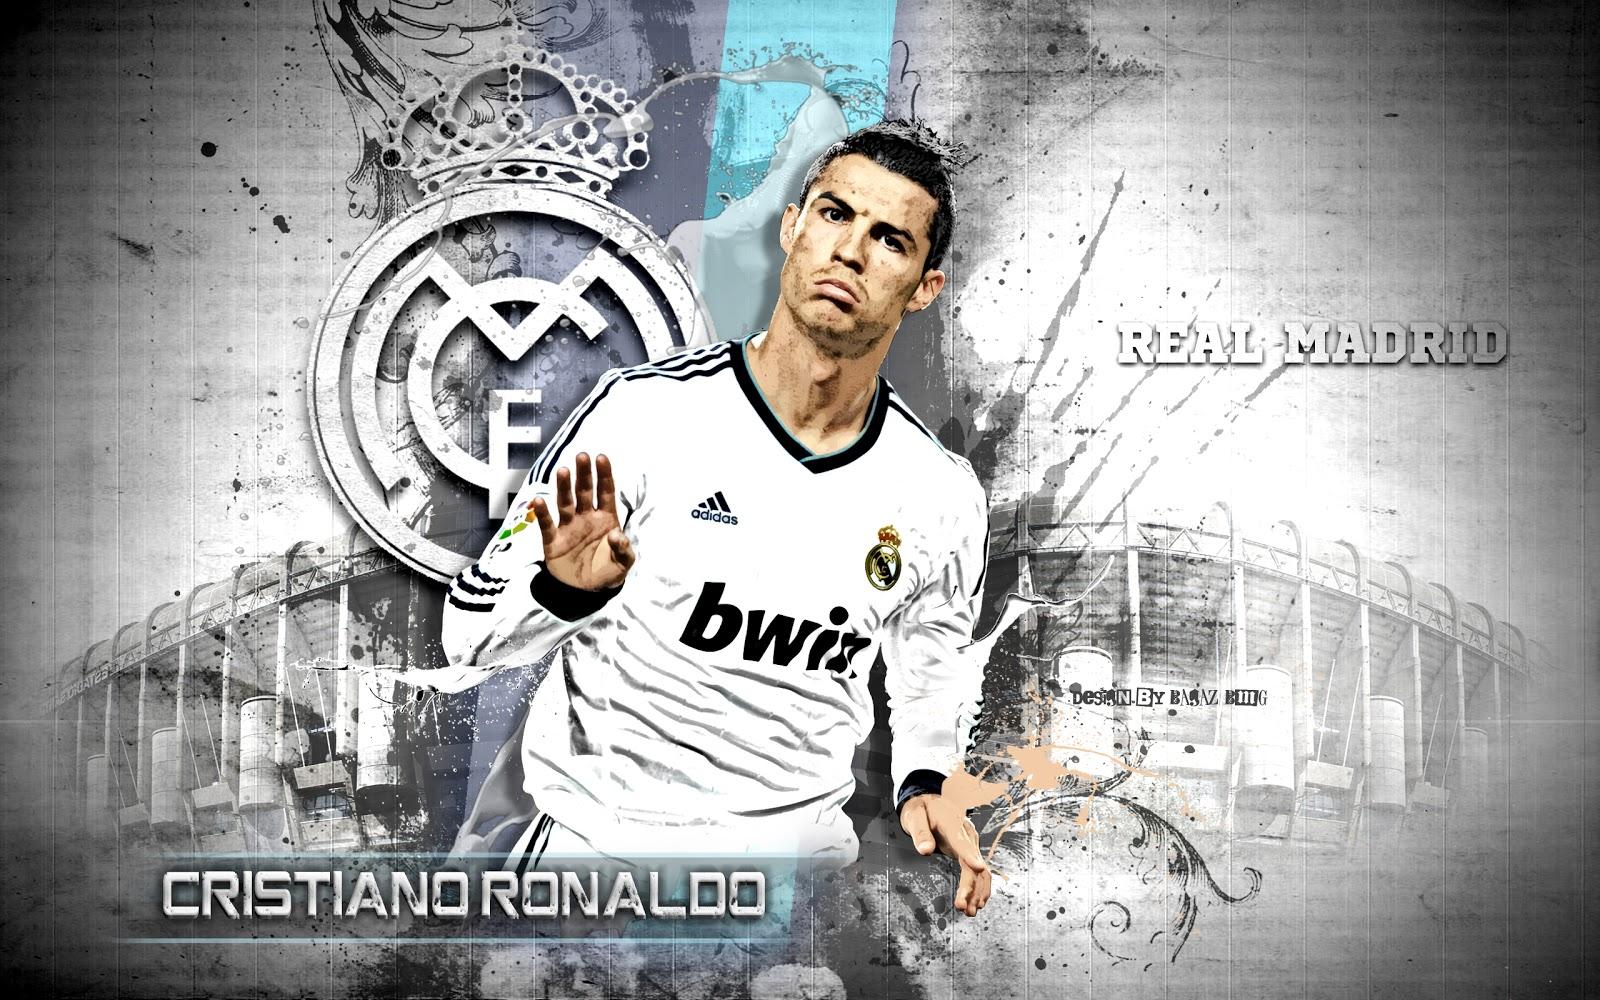 Cristiano Ronaldo Real Madrid 2013 HD Wallpaper 536 1600x1000